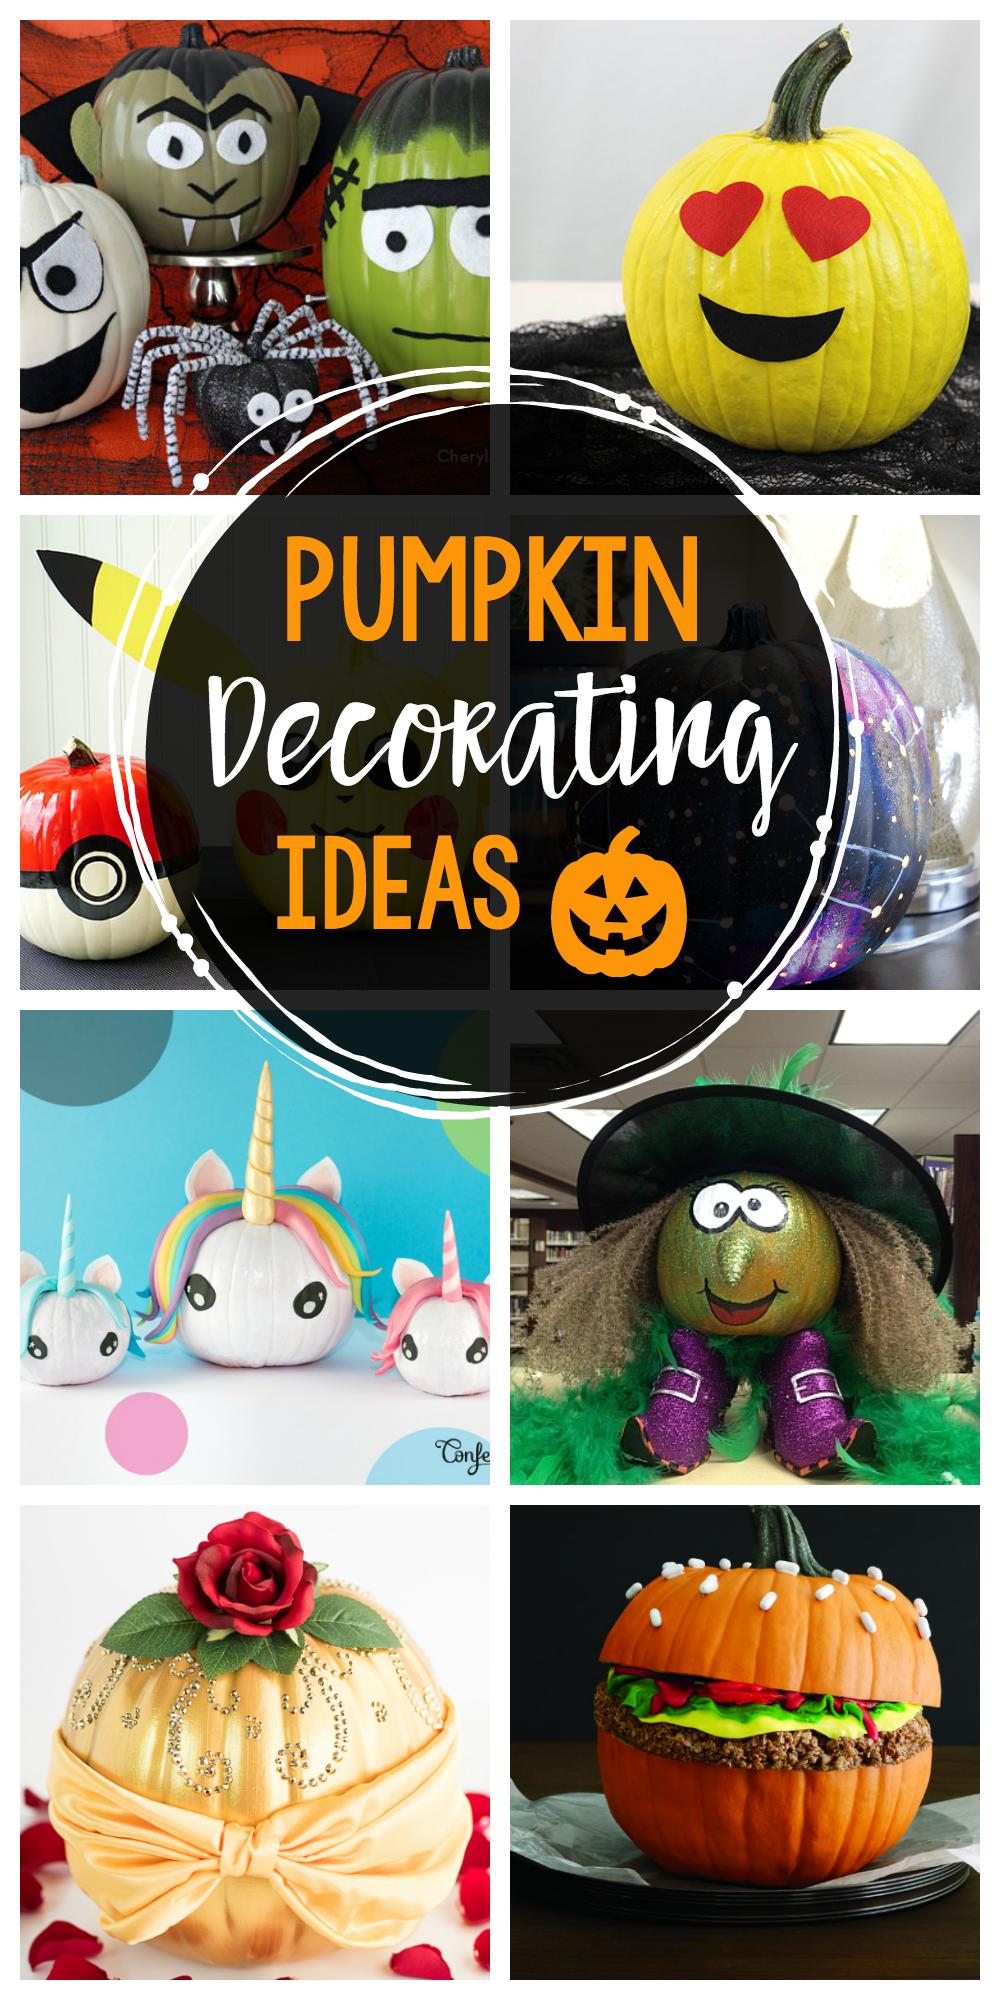 25 Fun Pumpkin Decorating Ideas-These cute no carve pumpkins are a fun way to celebrate Halloween! #halloween #halloweencrafts #pumpkins